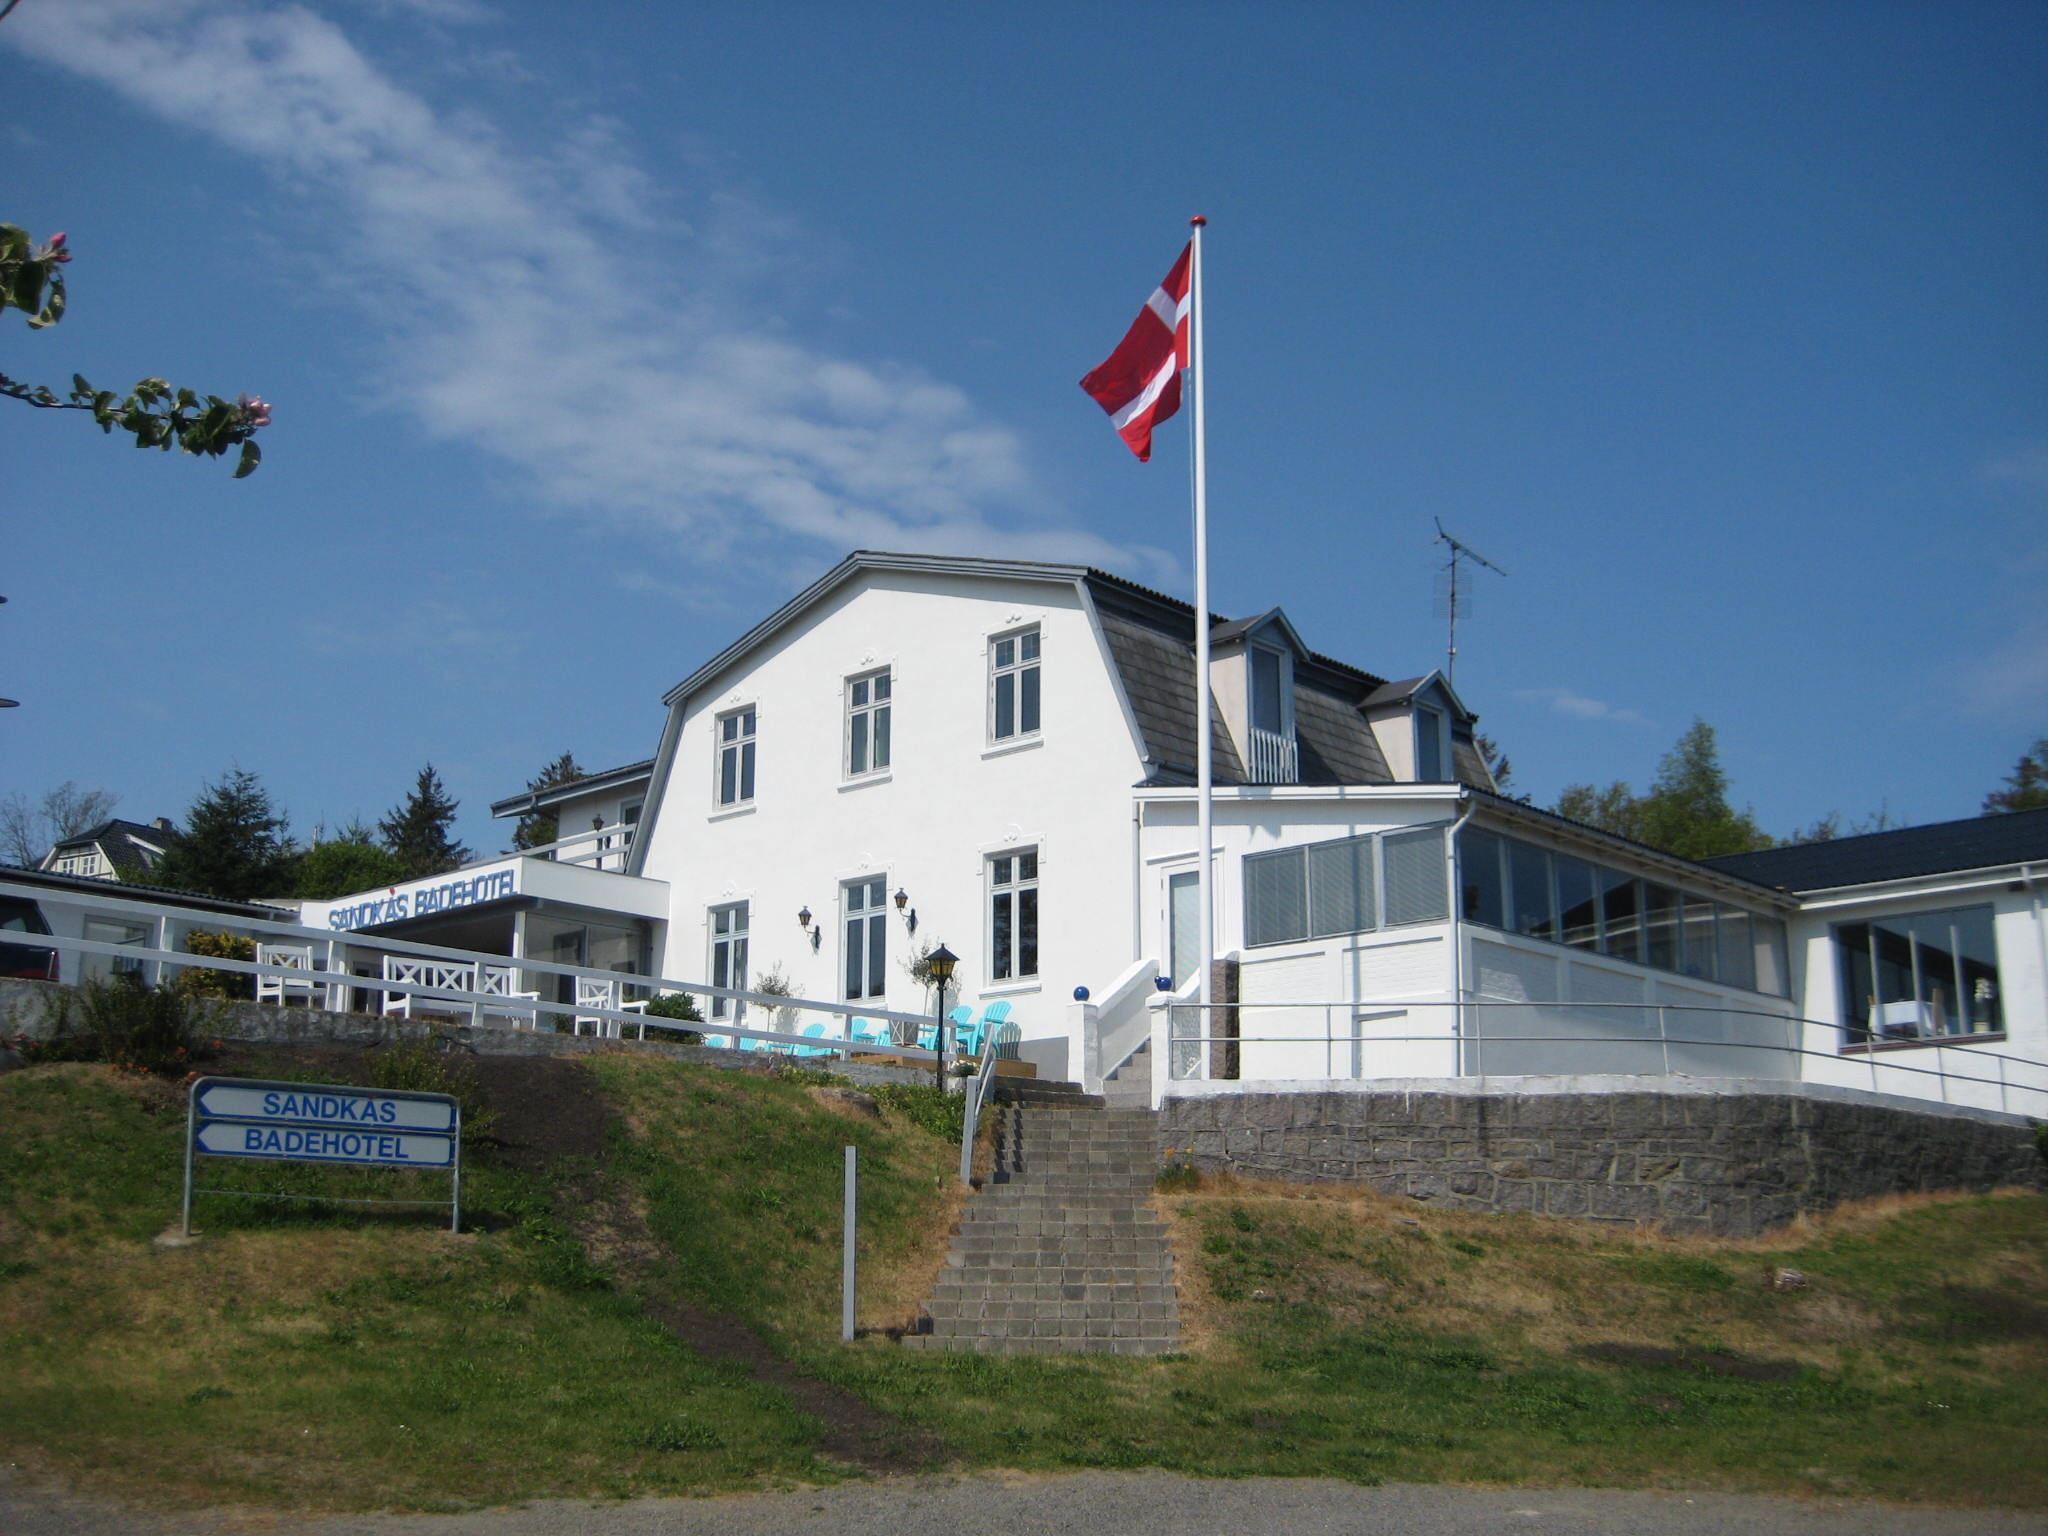 Sandkås Badehotel